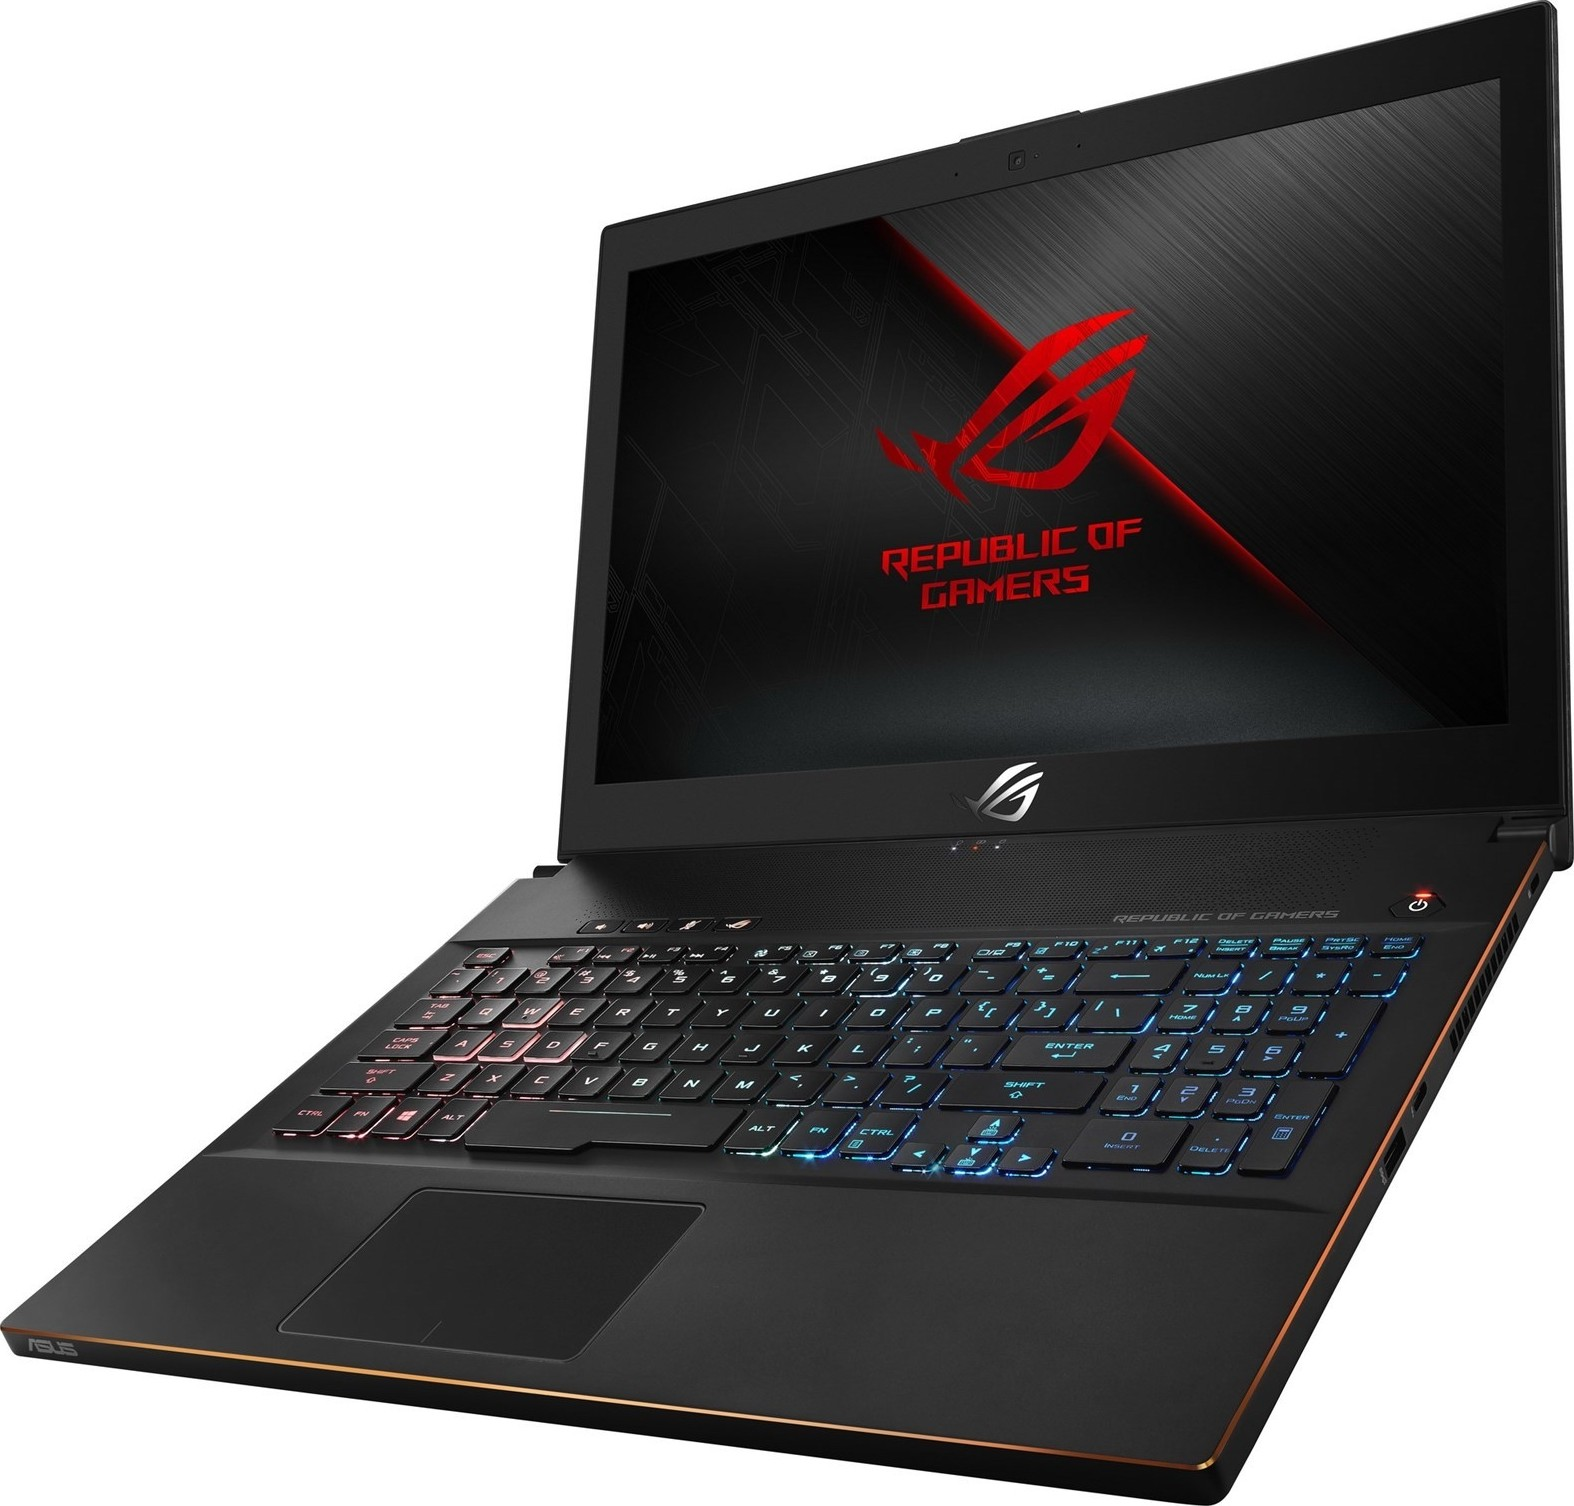 Asus Gm501gs Ei005t Zephyrus I7 8750h 22 Ghz 16gb Ram 1tb Frame Keybord Laptop X 455 Casing